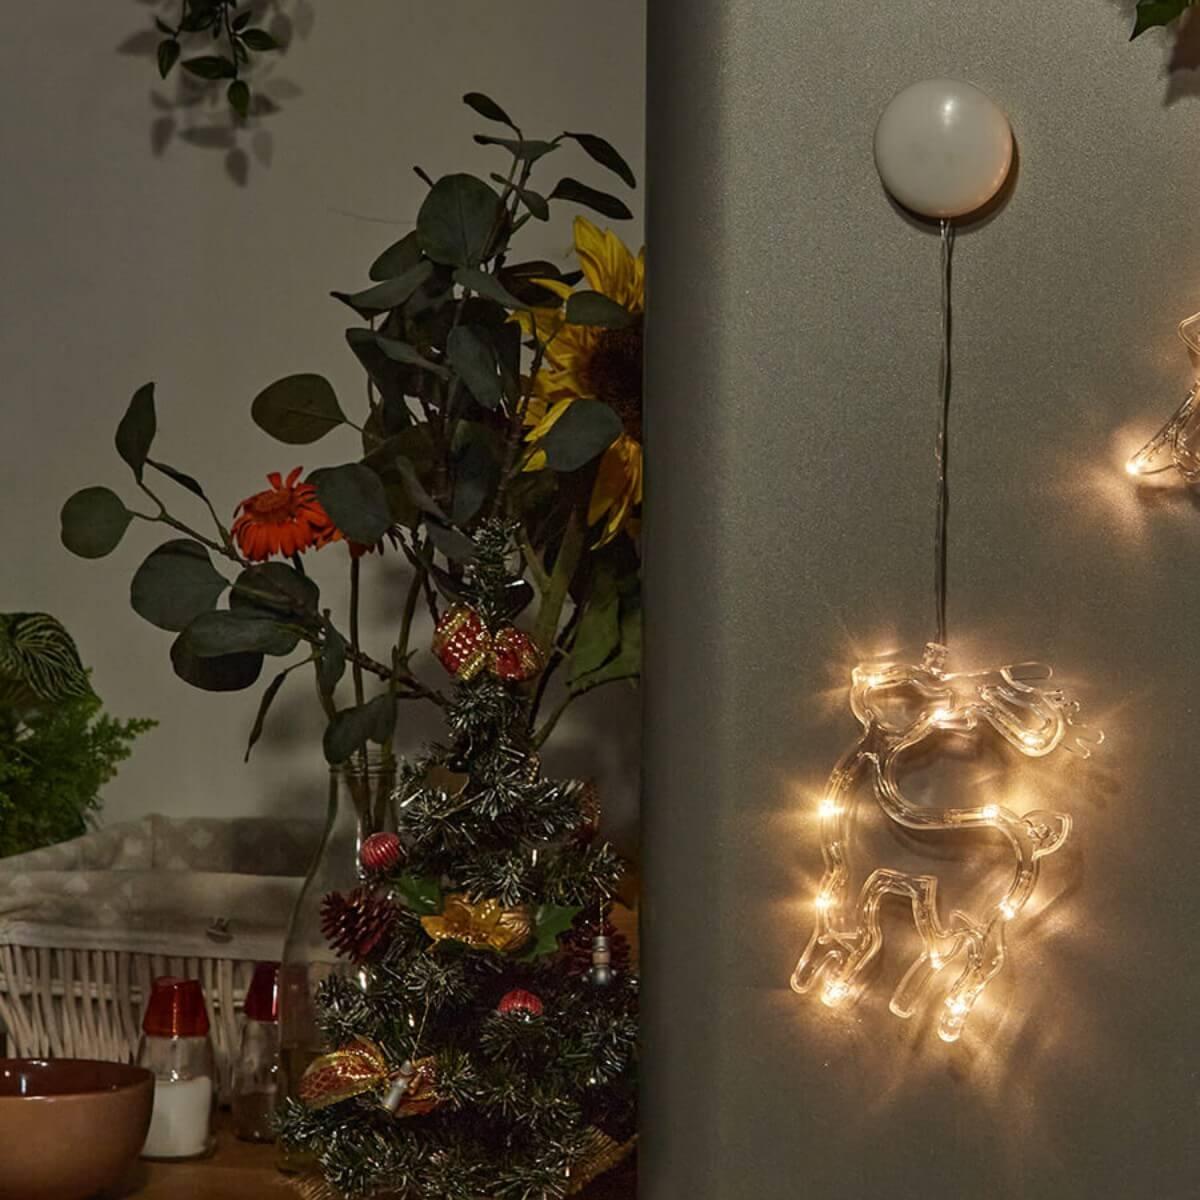 Светильник Uniel ULD-H1419-010/STA/3AAA Warm White IP20 Deer Новогодний подвес